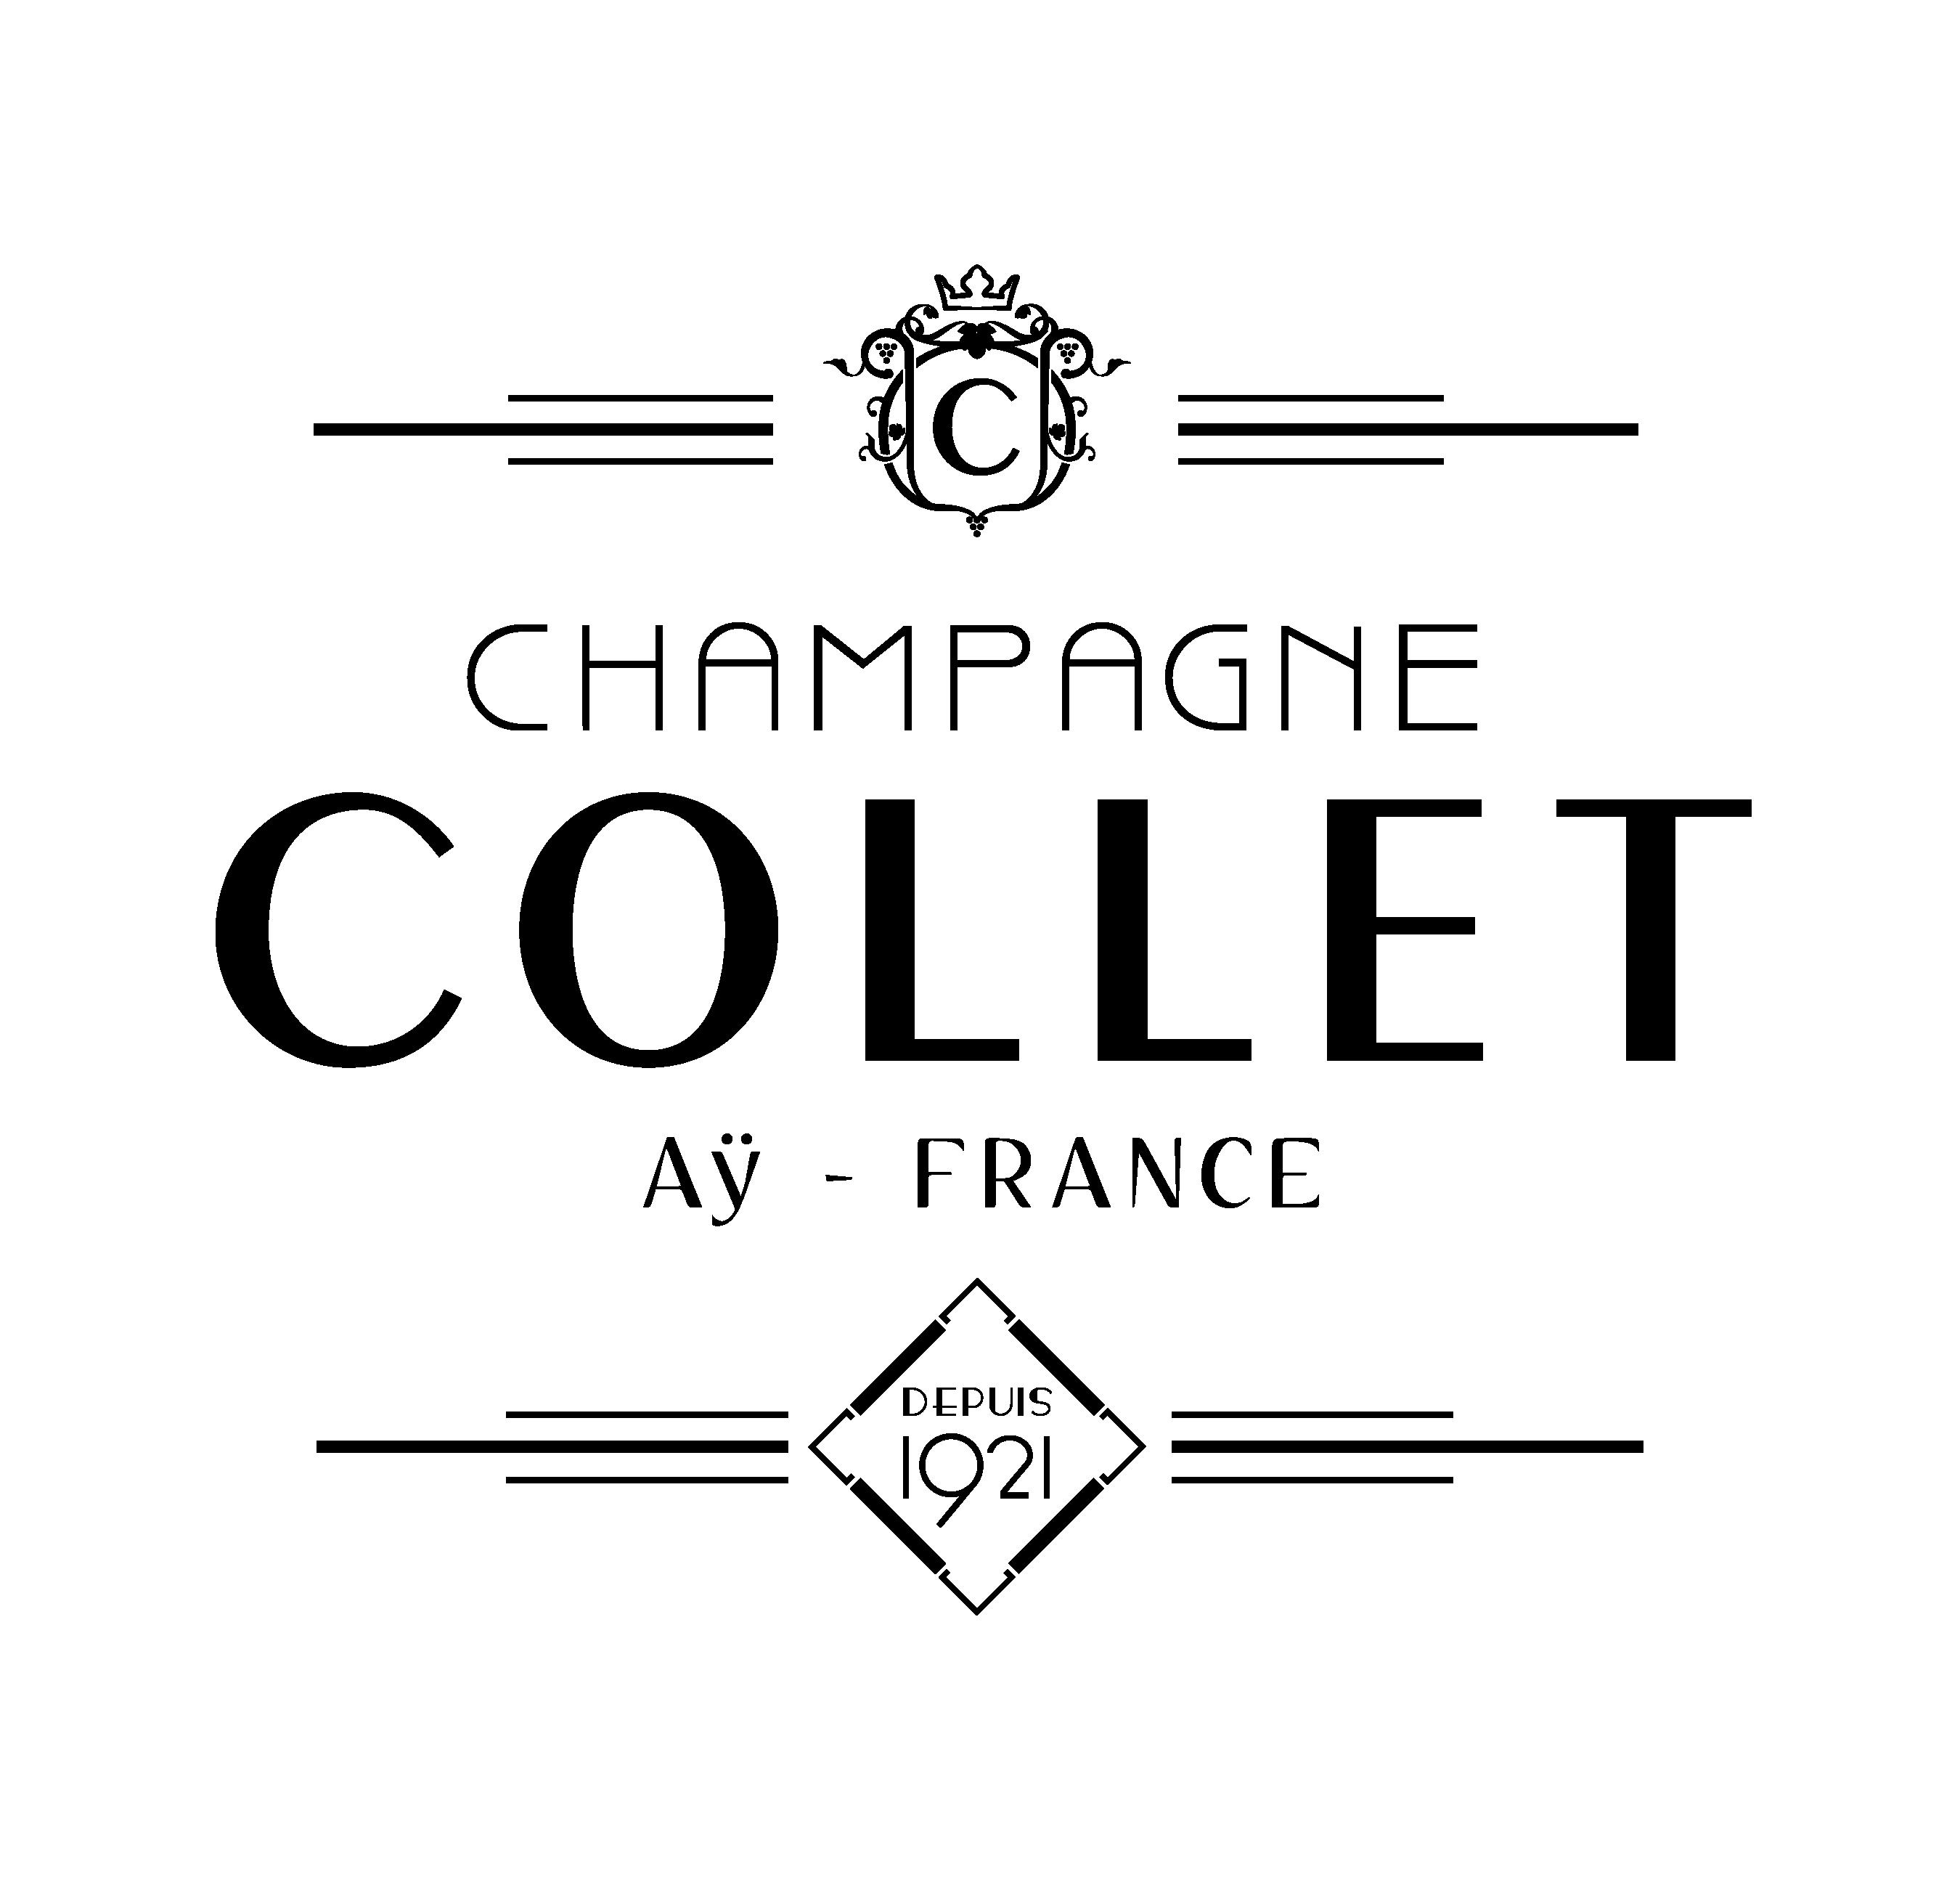 Champagne Collet logo